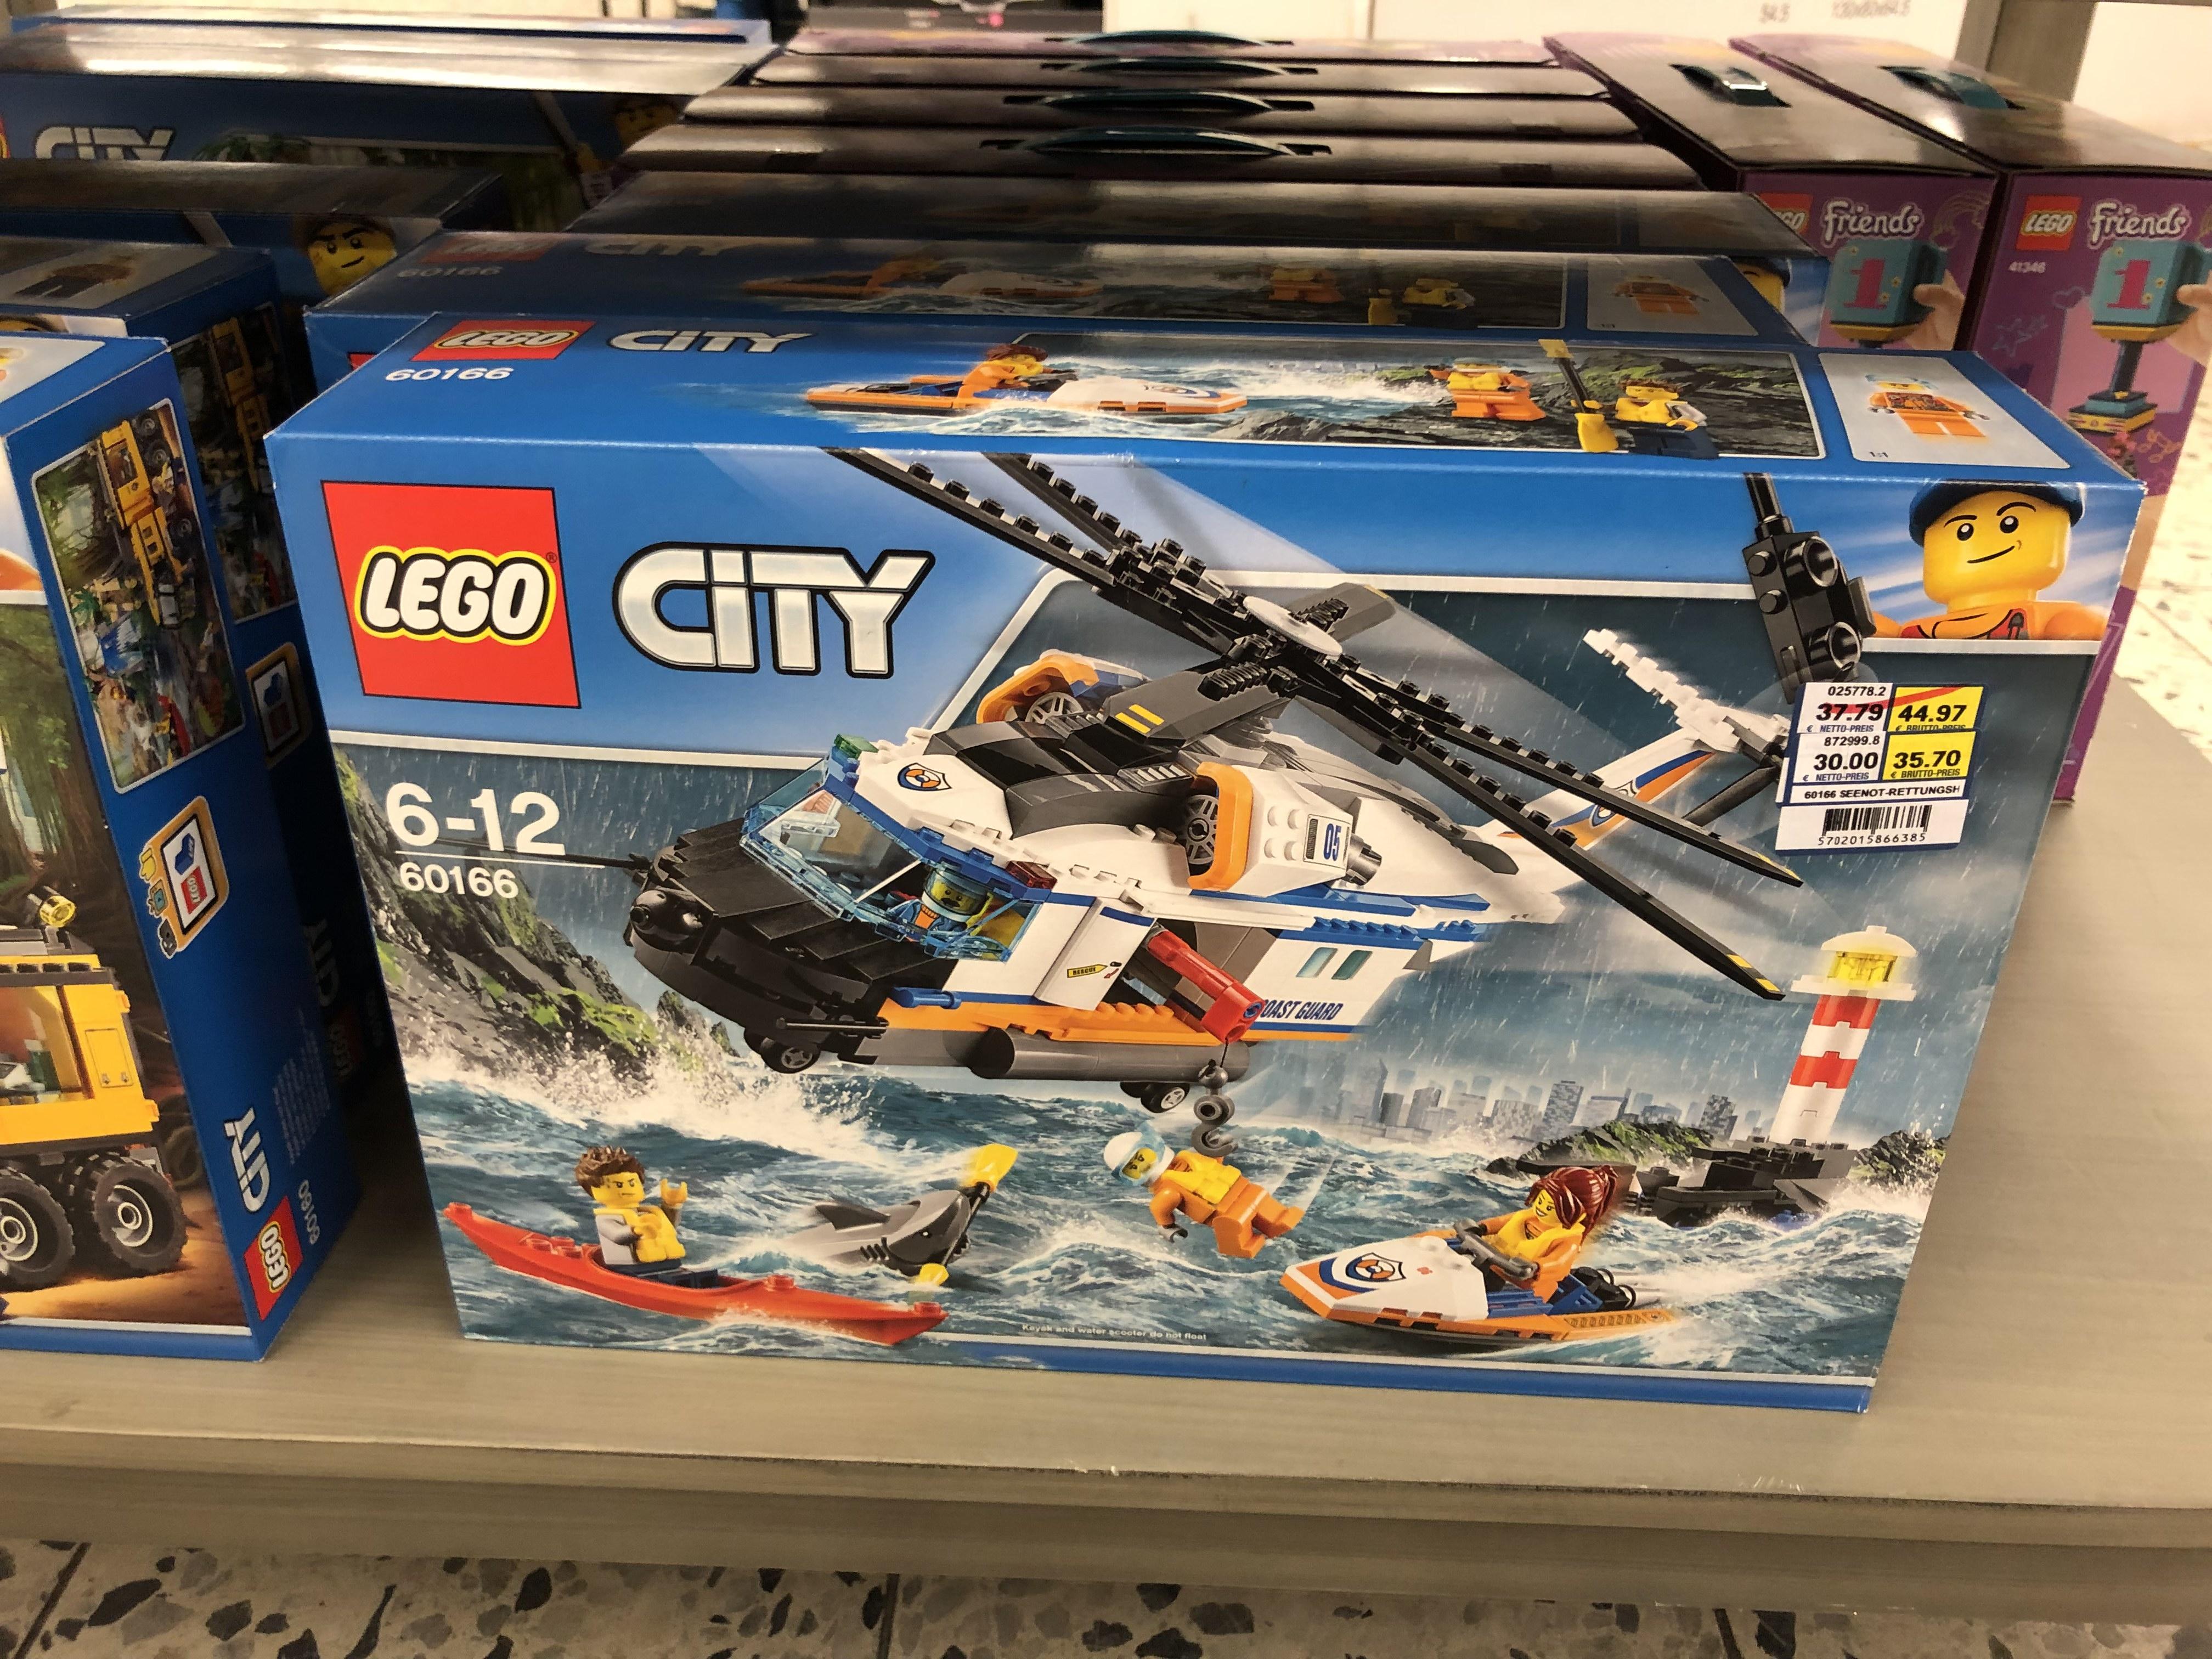 [Lokal?] Metro Laatzen 20% auf Lego Playmobil u.a.